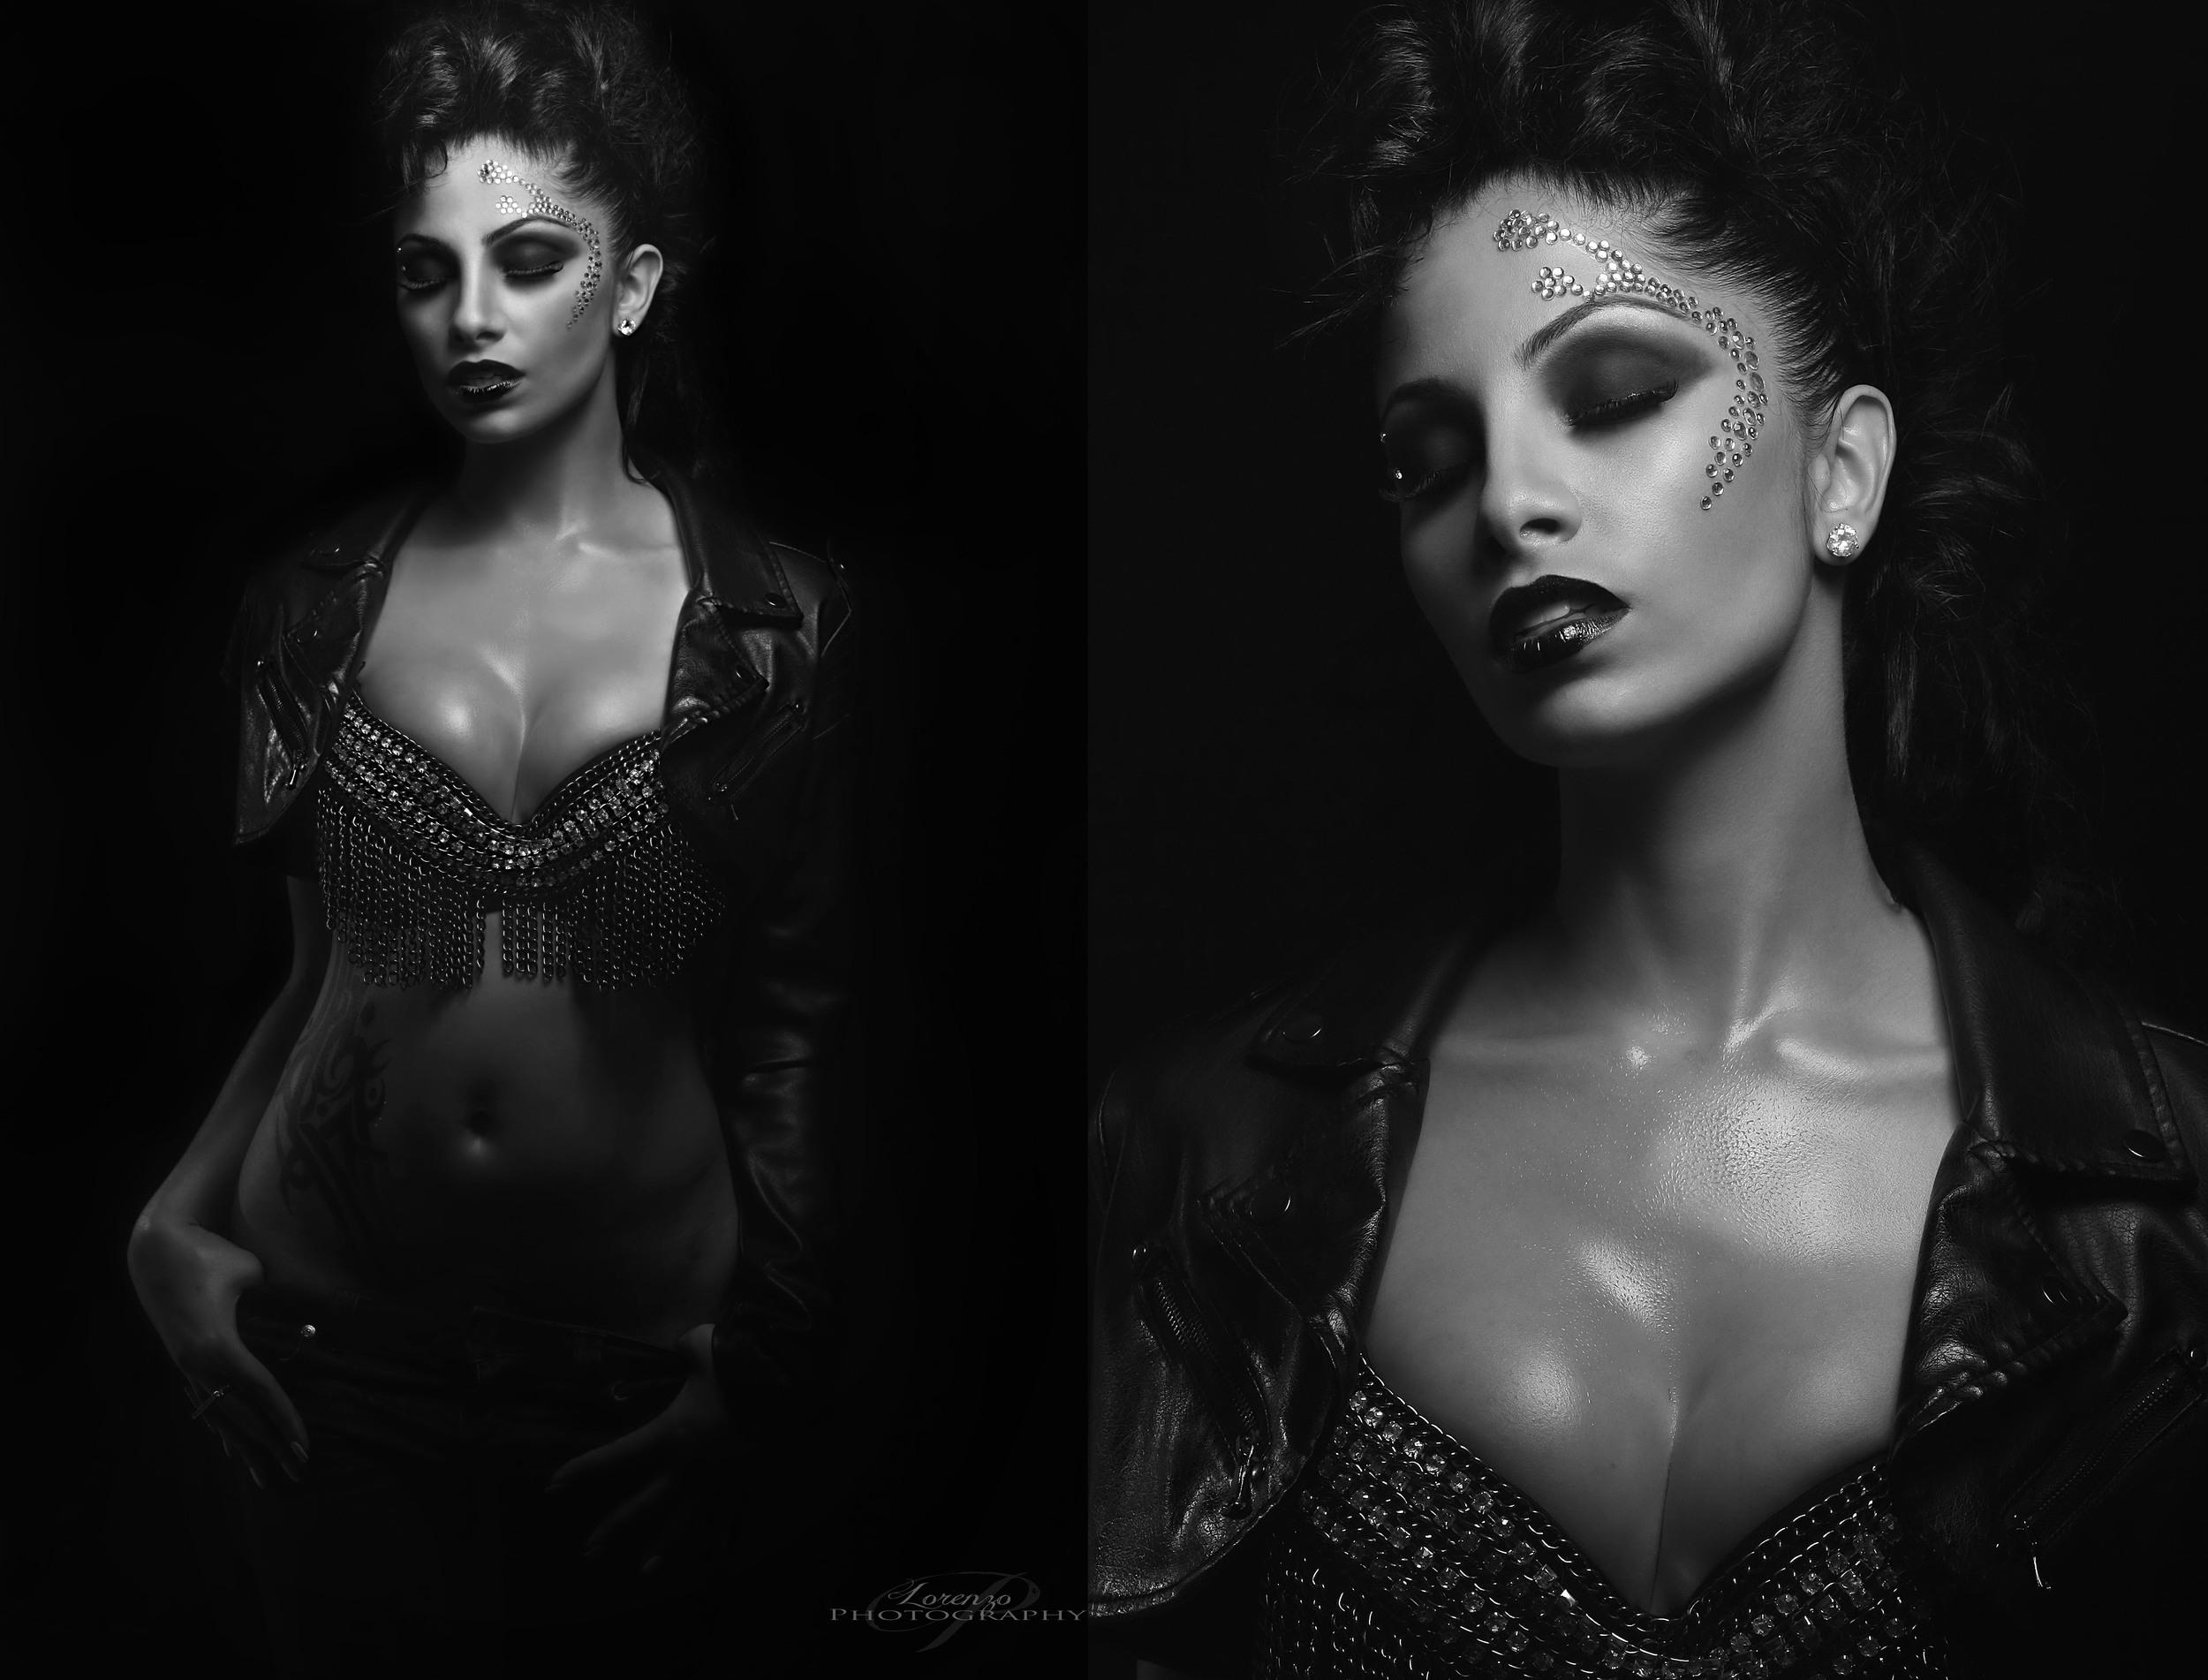 Model: Amarie. S.